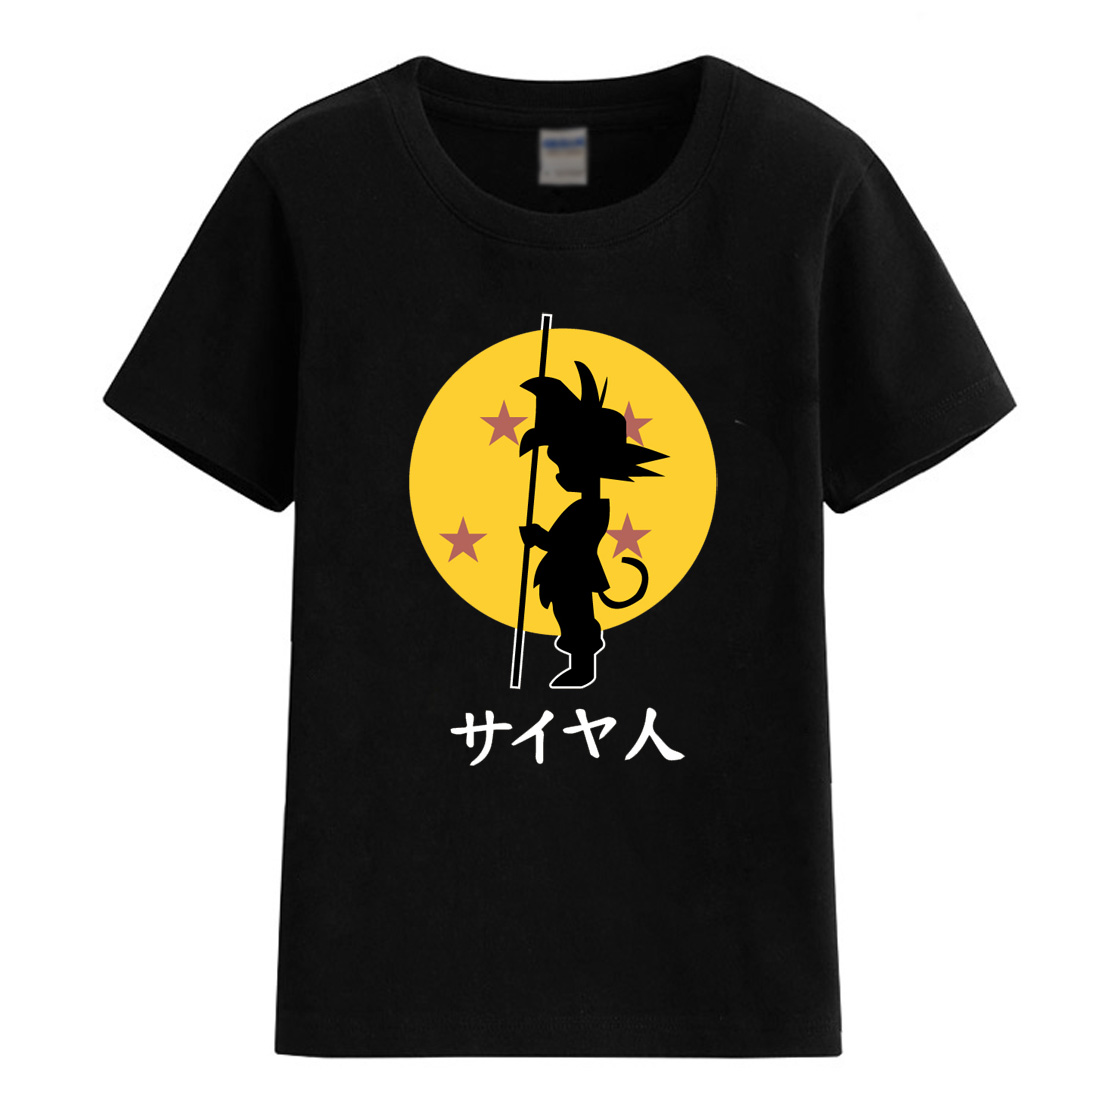 2018 summer Dragon Ball Z Goku childrens clothing boys T-shirts for girls fashion casual brand tops anime tshirts baby T-shirt